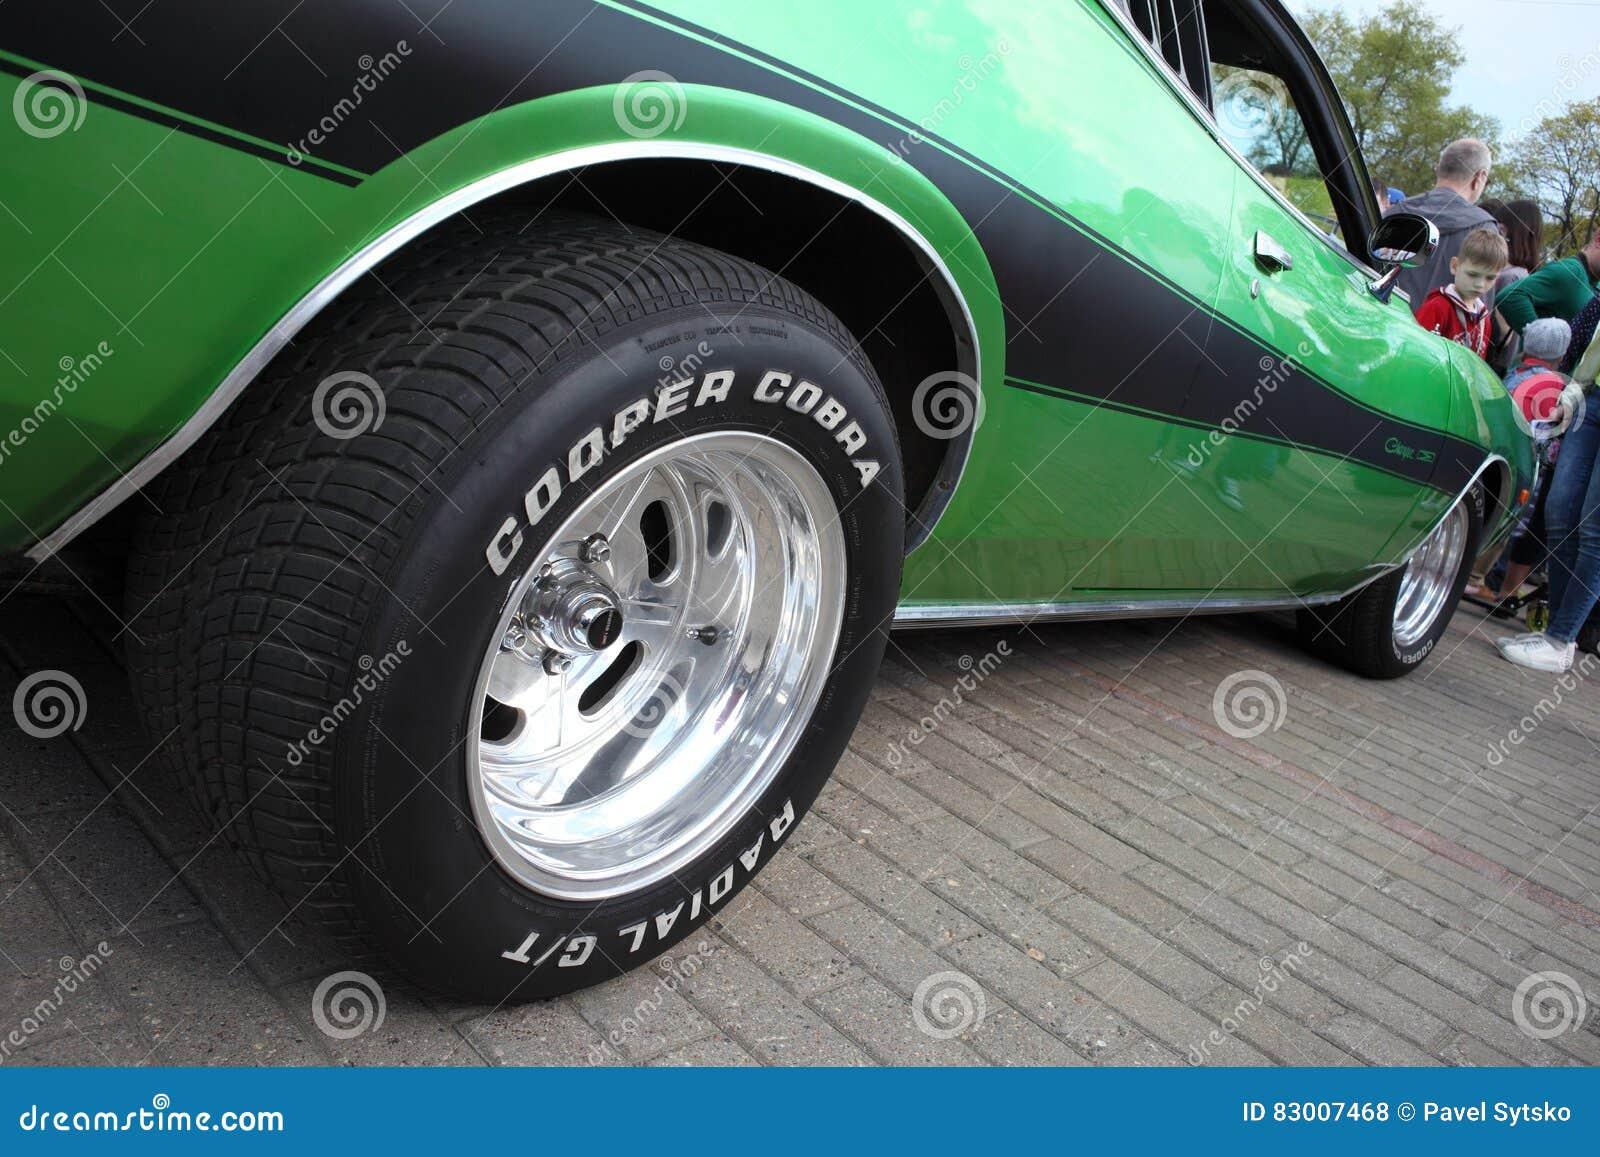 the wheel of dodge car at motor show, belarus, minsk, may, 07.2016